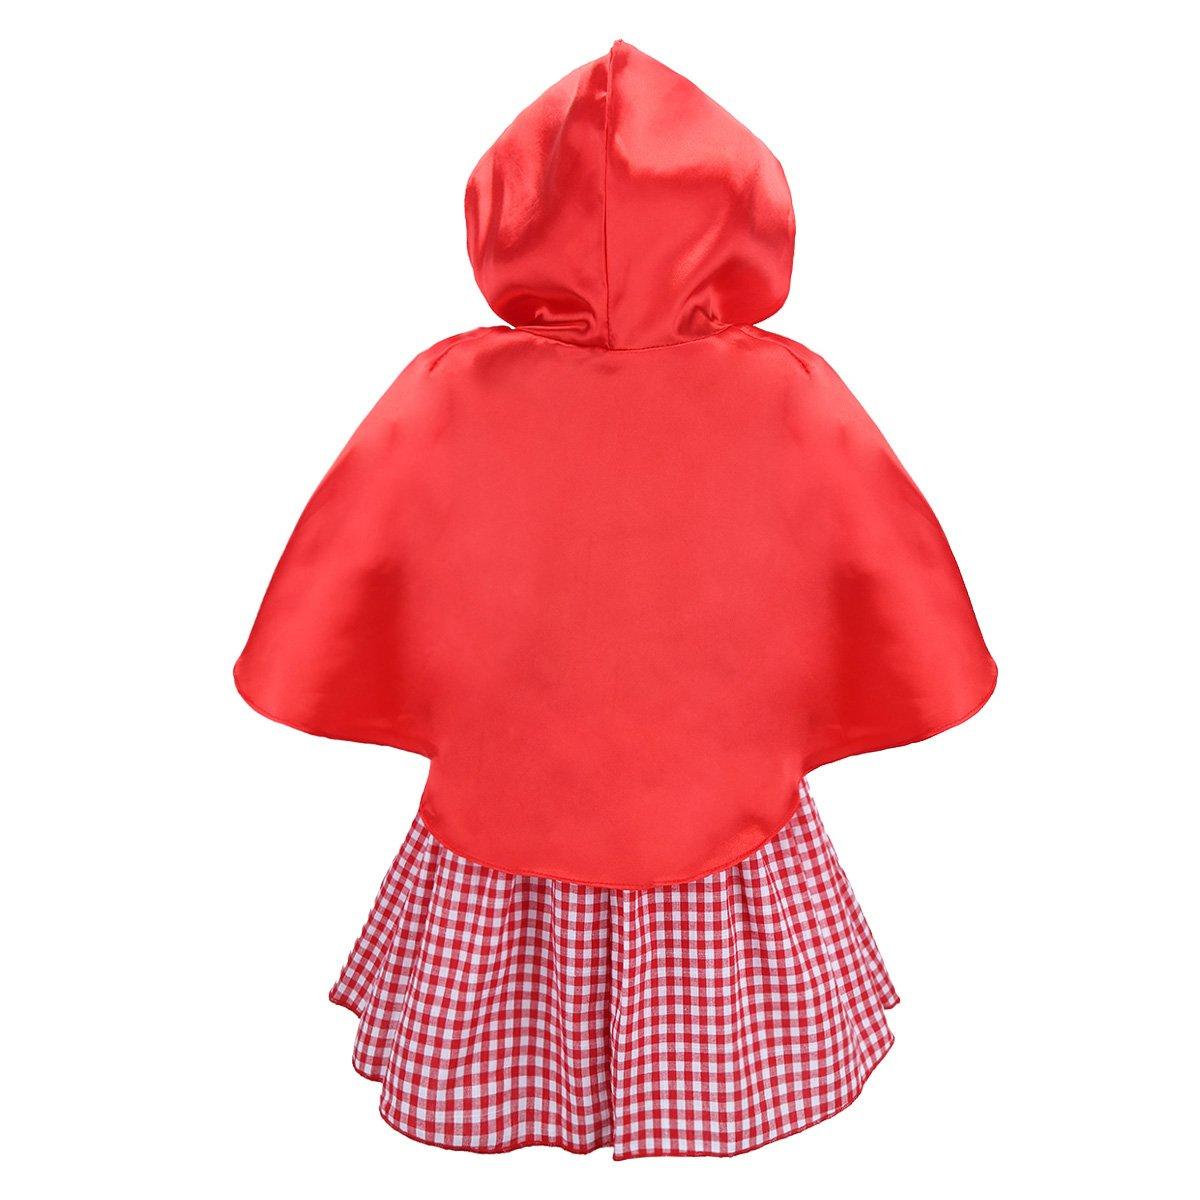 iiniim Baby Girls Halloween Party Costumes Short Sleeves Dress with Hooded Cloak (18-24 Months) by iiniim (Image #2)